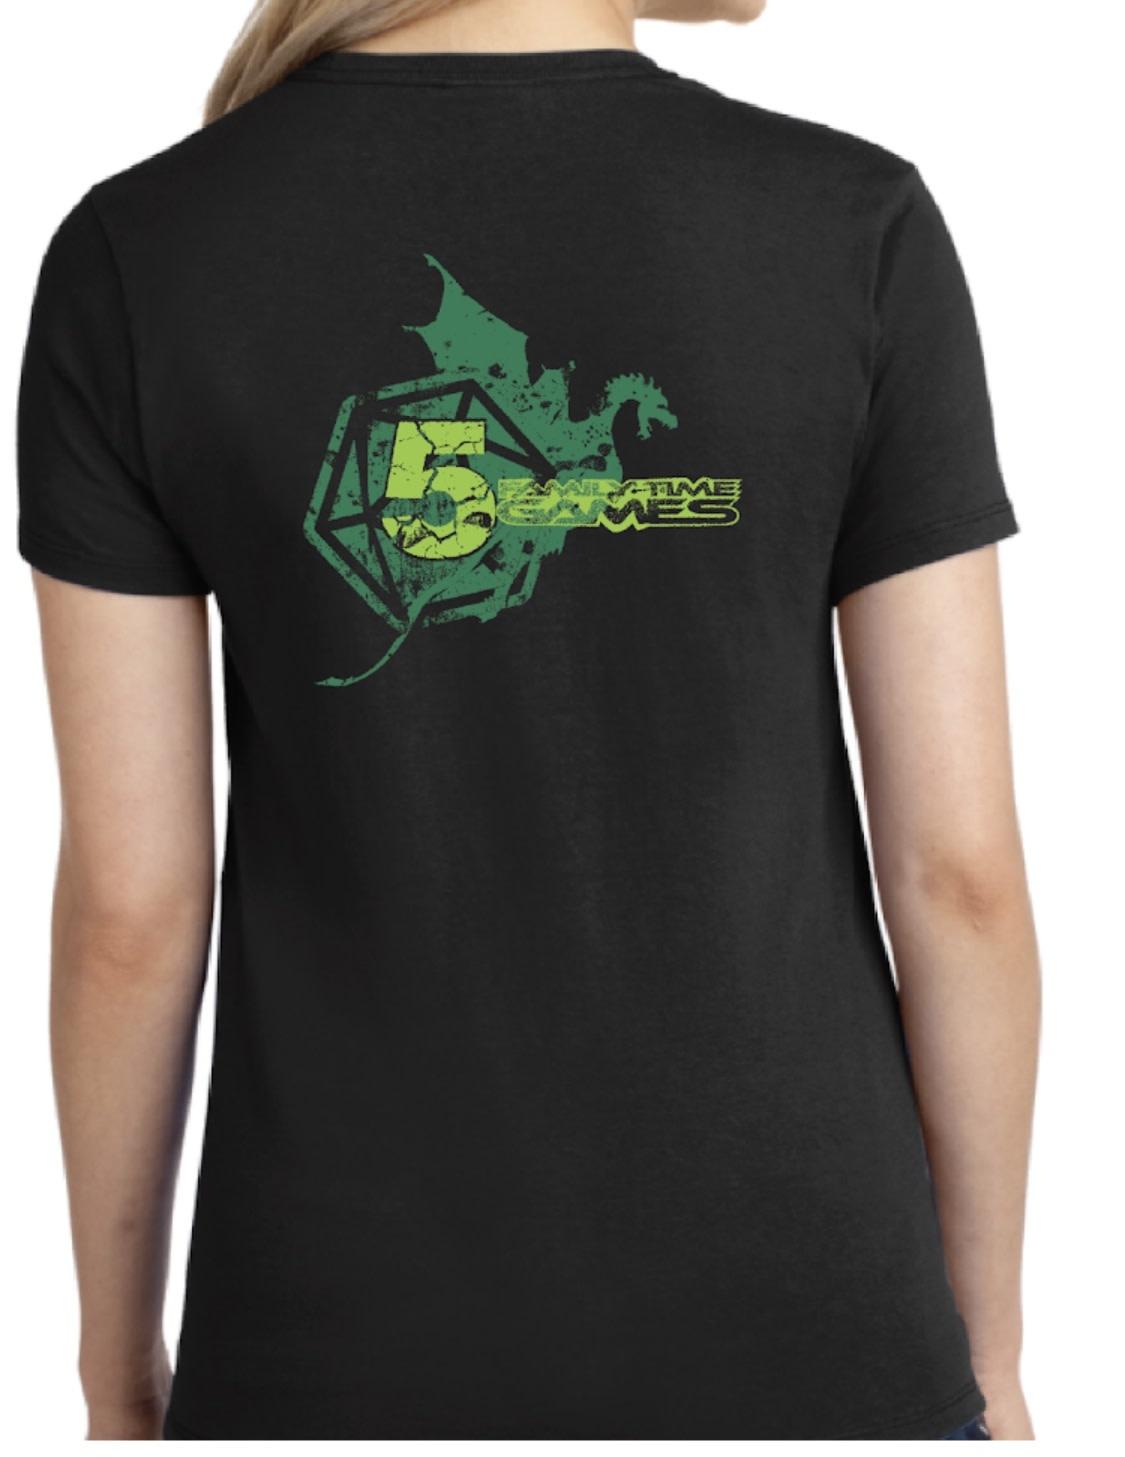 Team image 5 year Anniversary short sleeves shirt woman (size L)